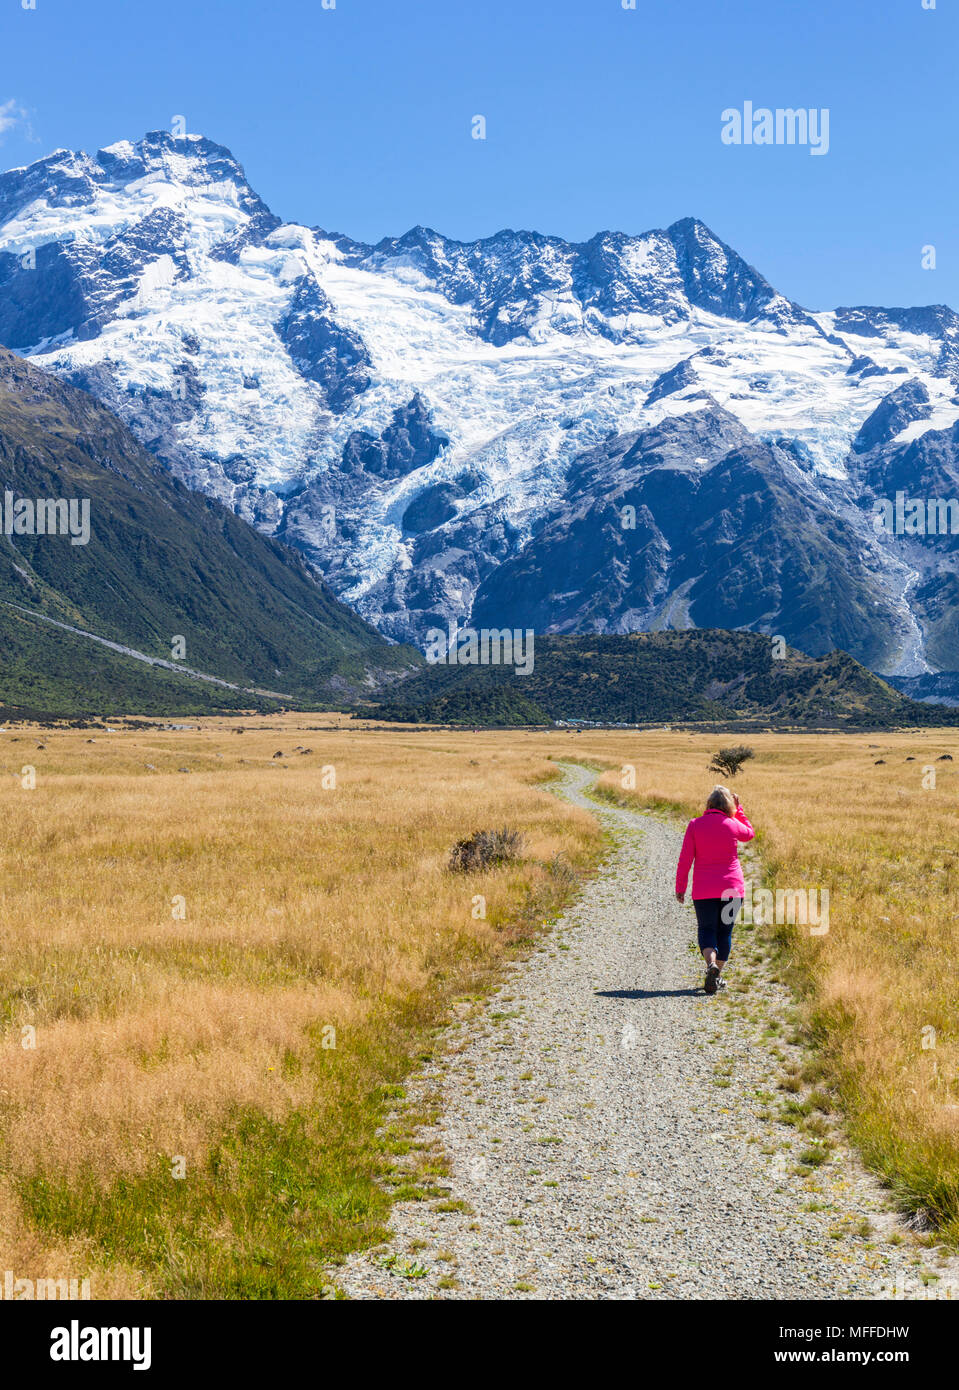 Neuseeland Südinsel Neuseeland Frau Tourist (Model Released) Wandern auf der Promenade von Cook Nationalpark South Island, Neuseeland Mount Stockbild